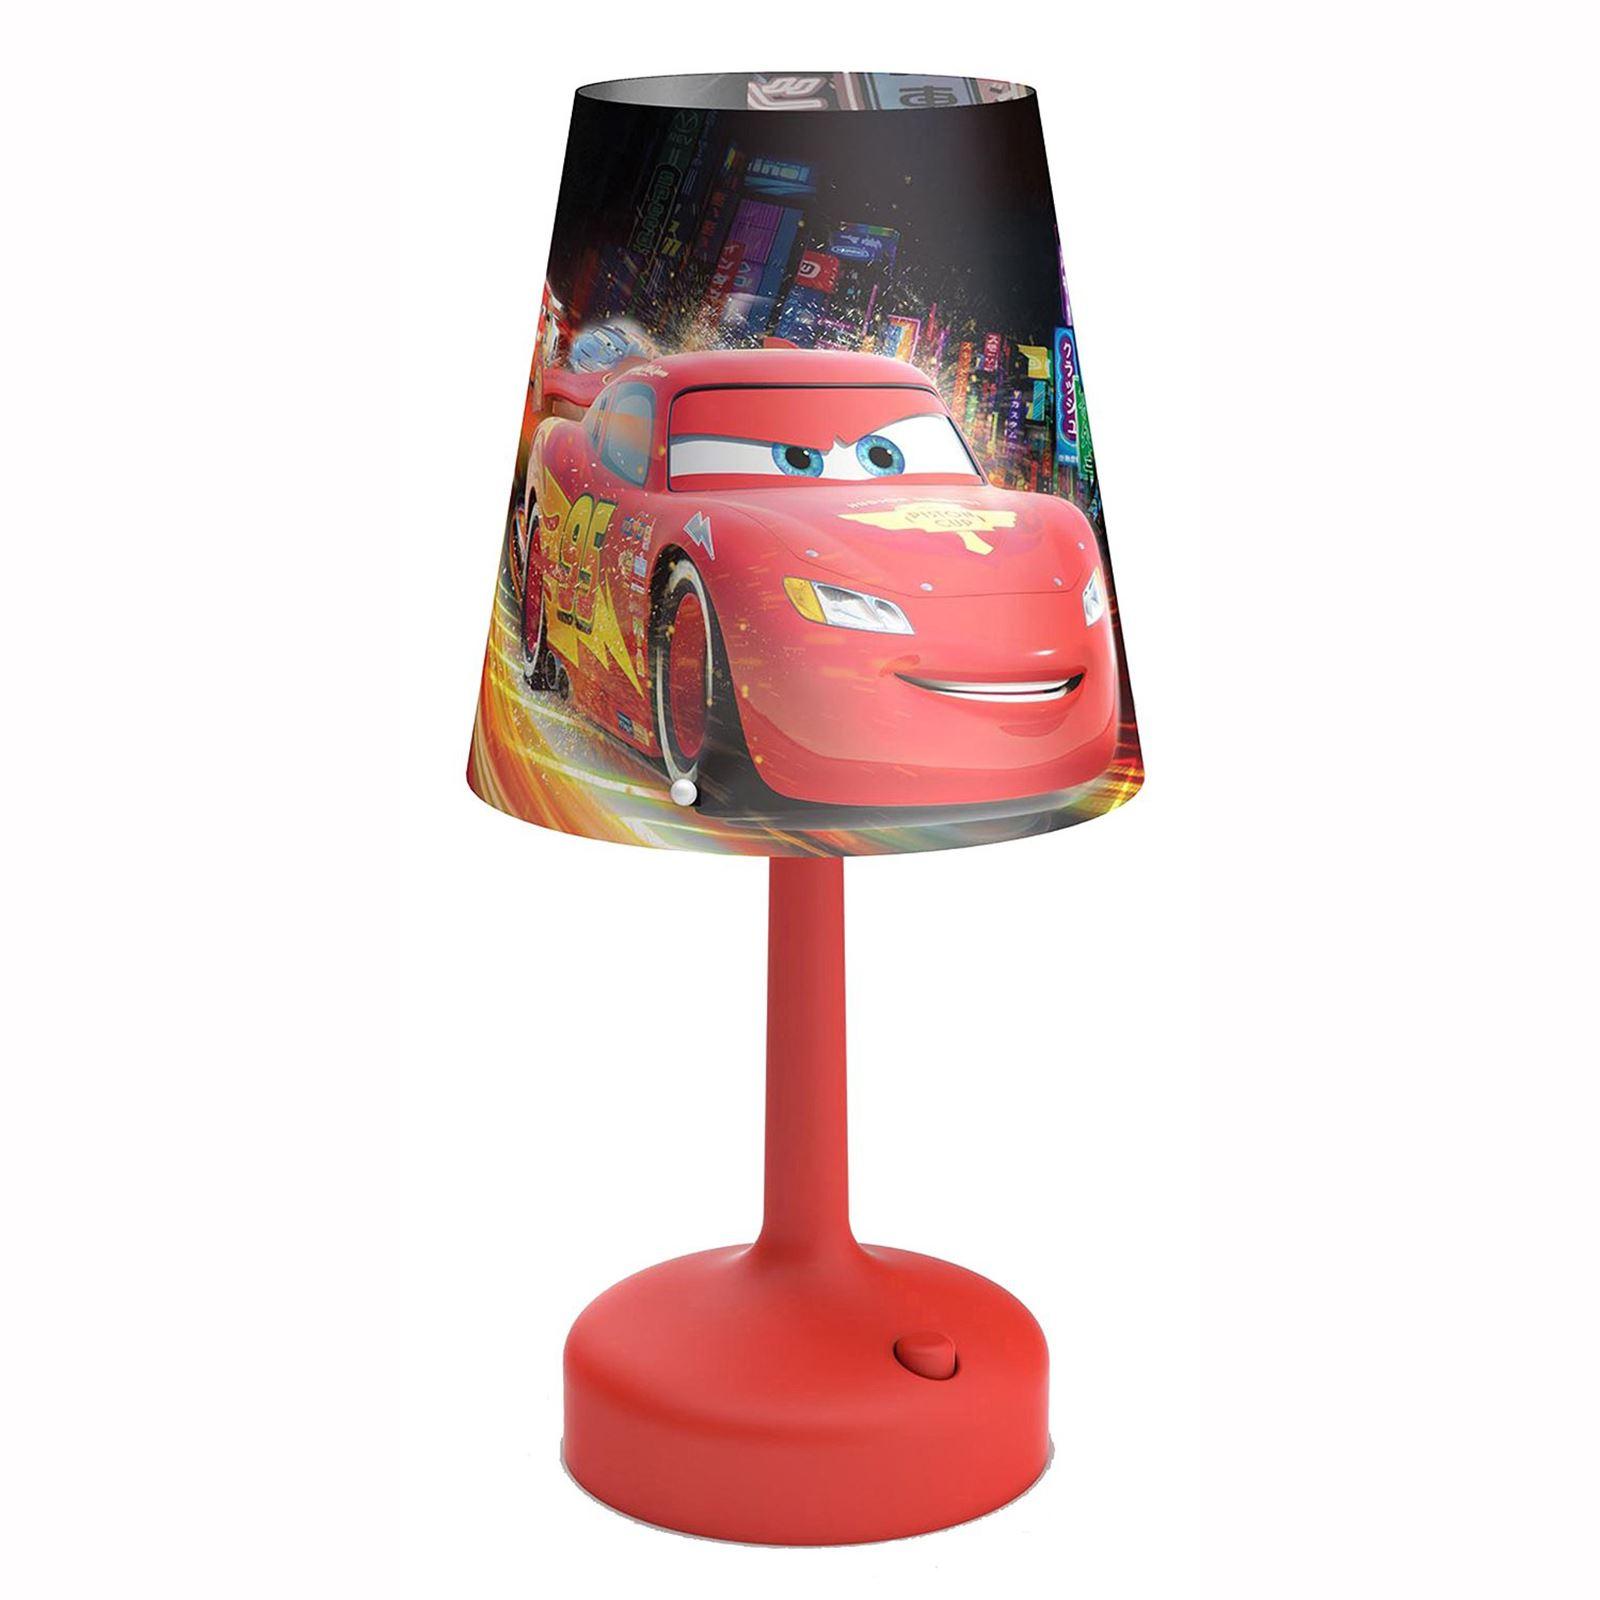 PHILIPS KIDS BED SIDE LAMPS VARIOUS DESIGNS LIGHTING